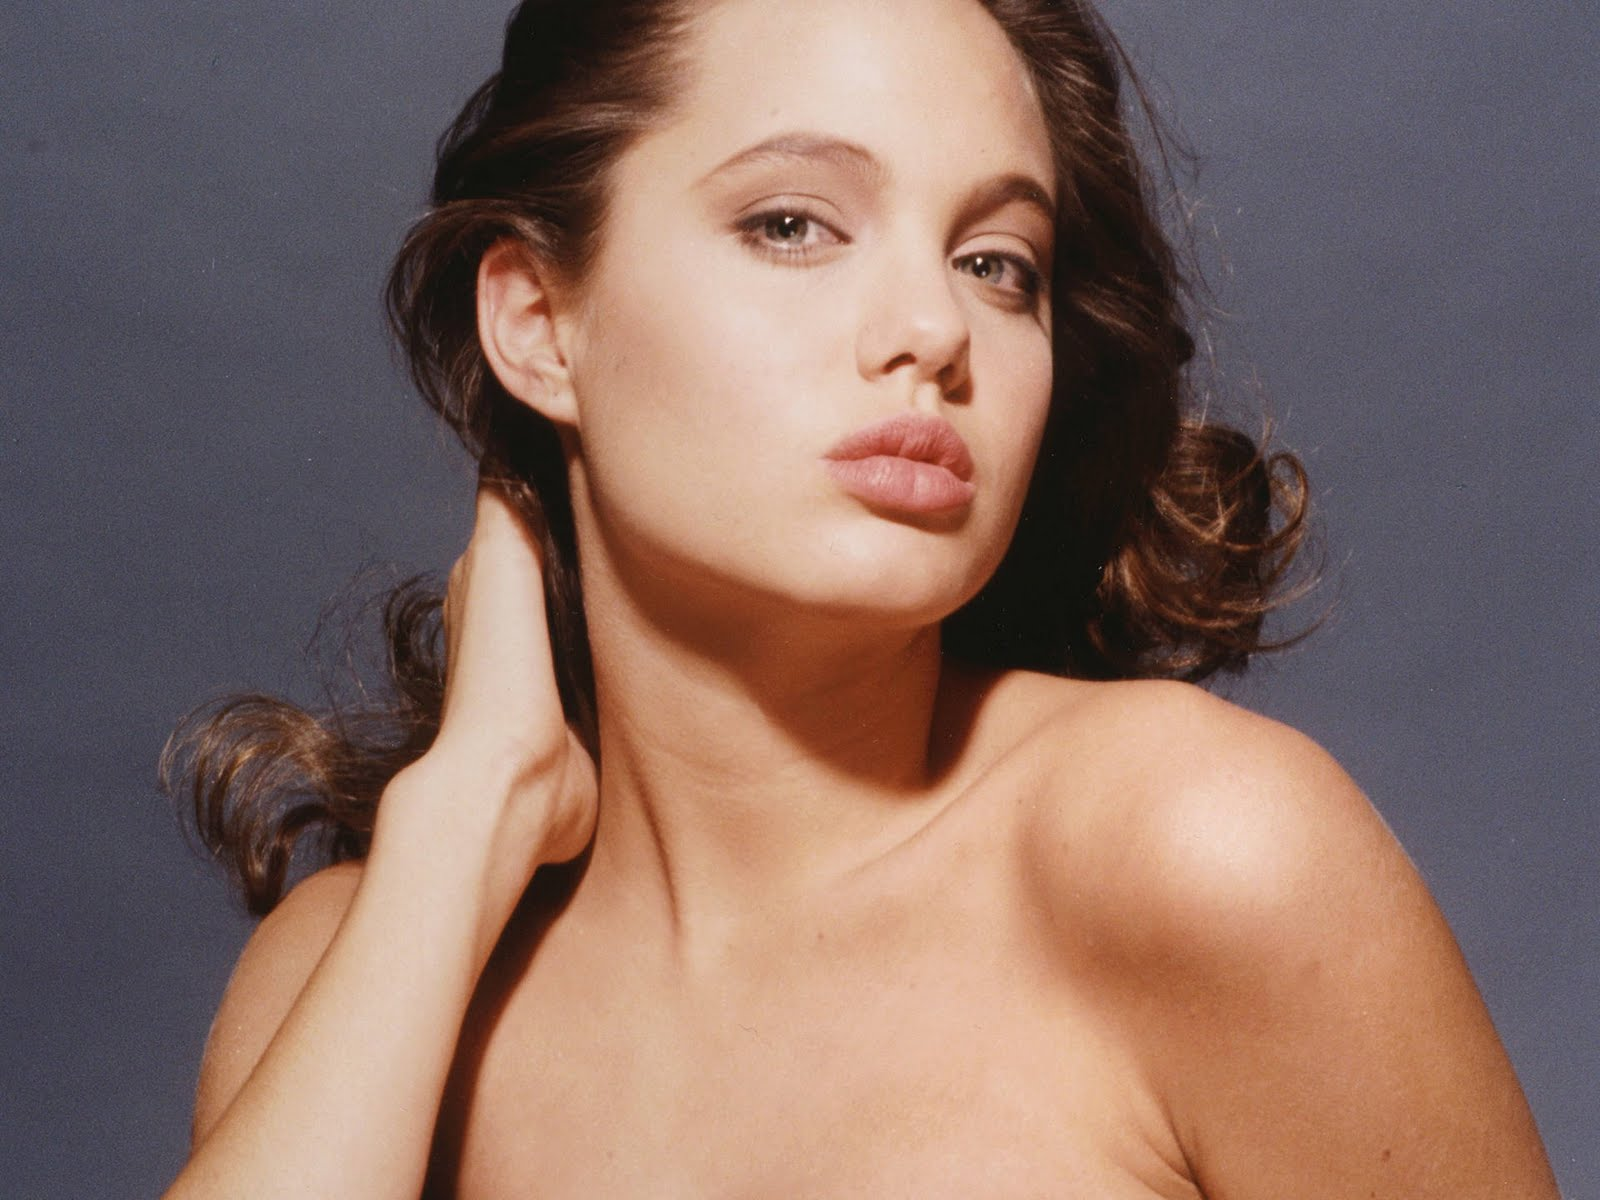 Angelina Jolie: Entertainment: Angelina Jolie